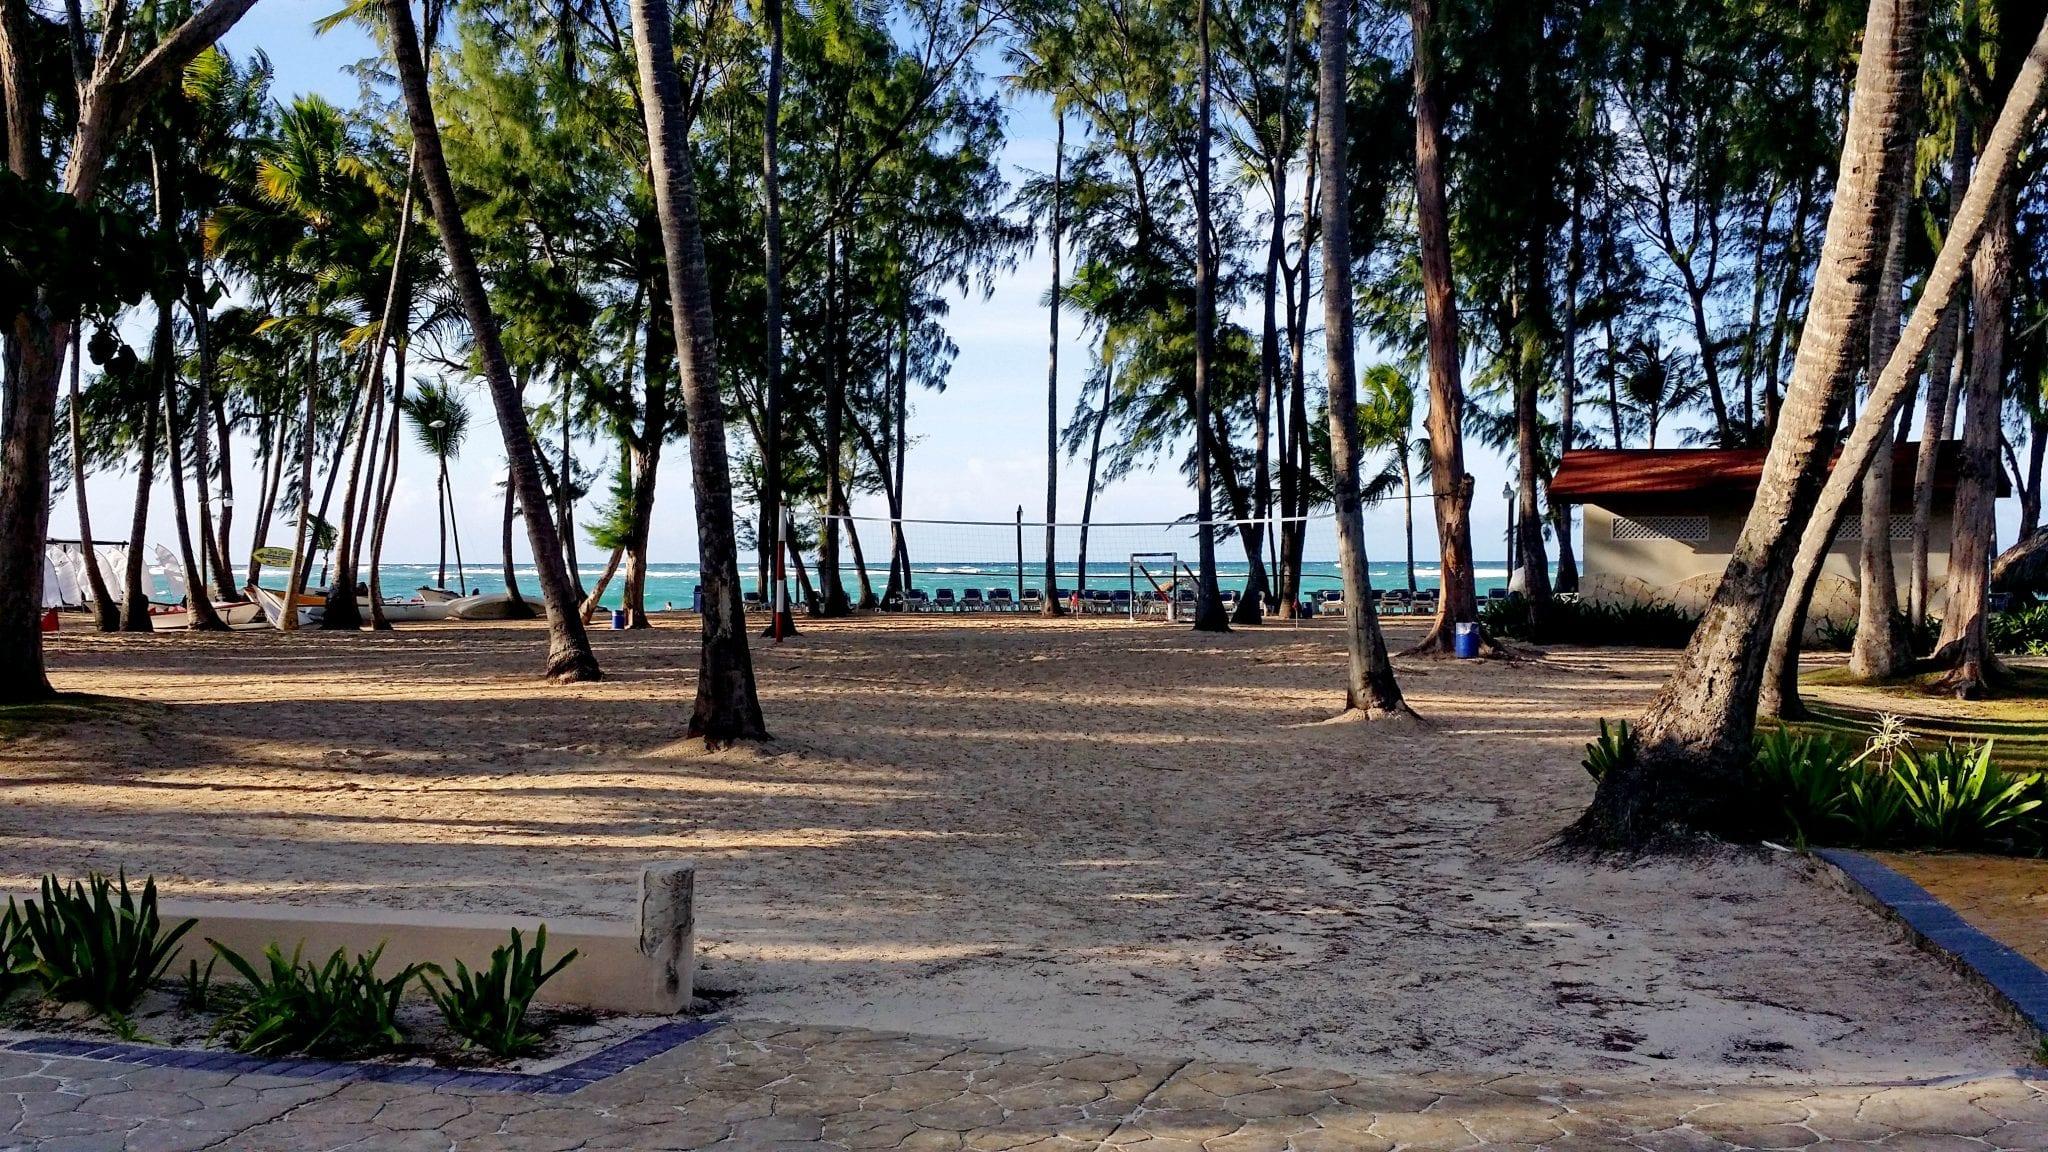 Strand mit Beachvolleyball Feld und Strandbar